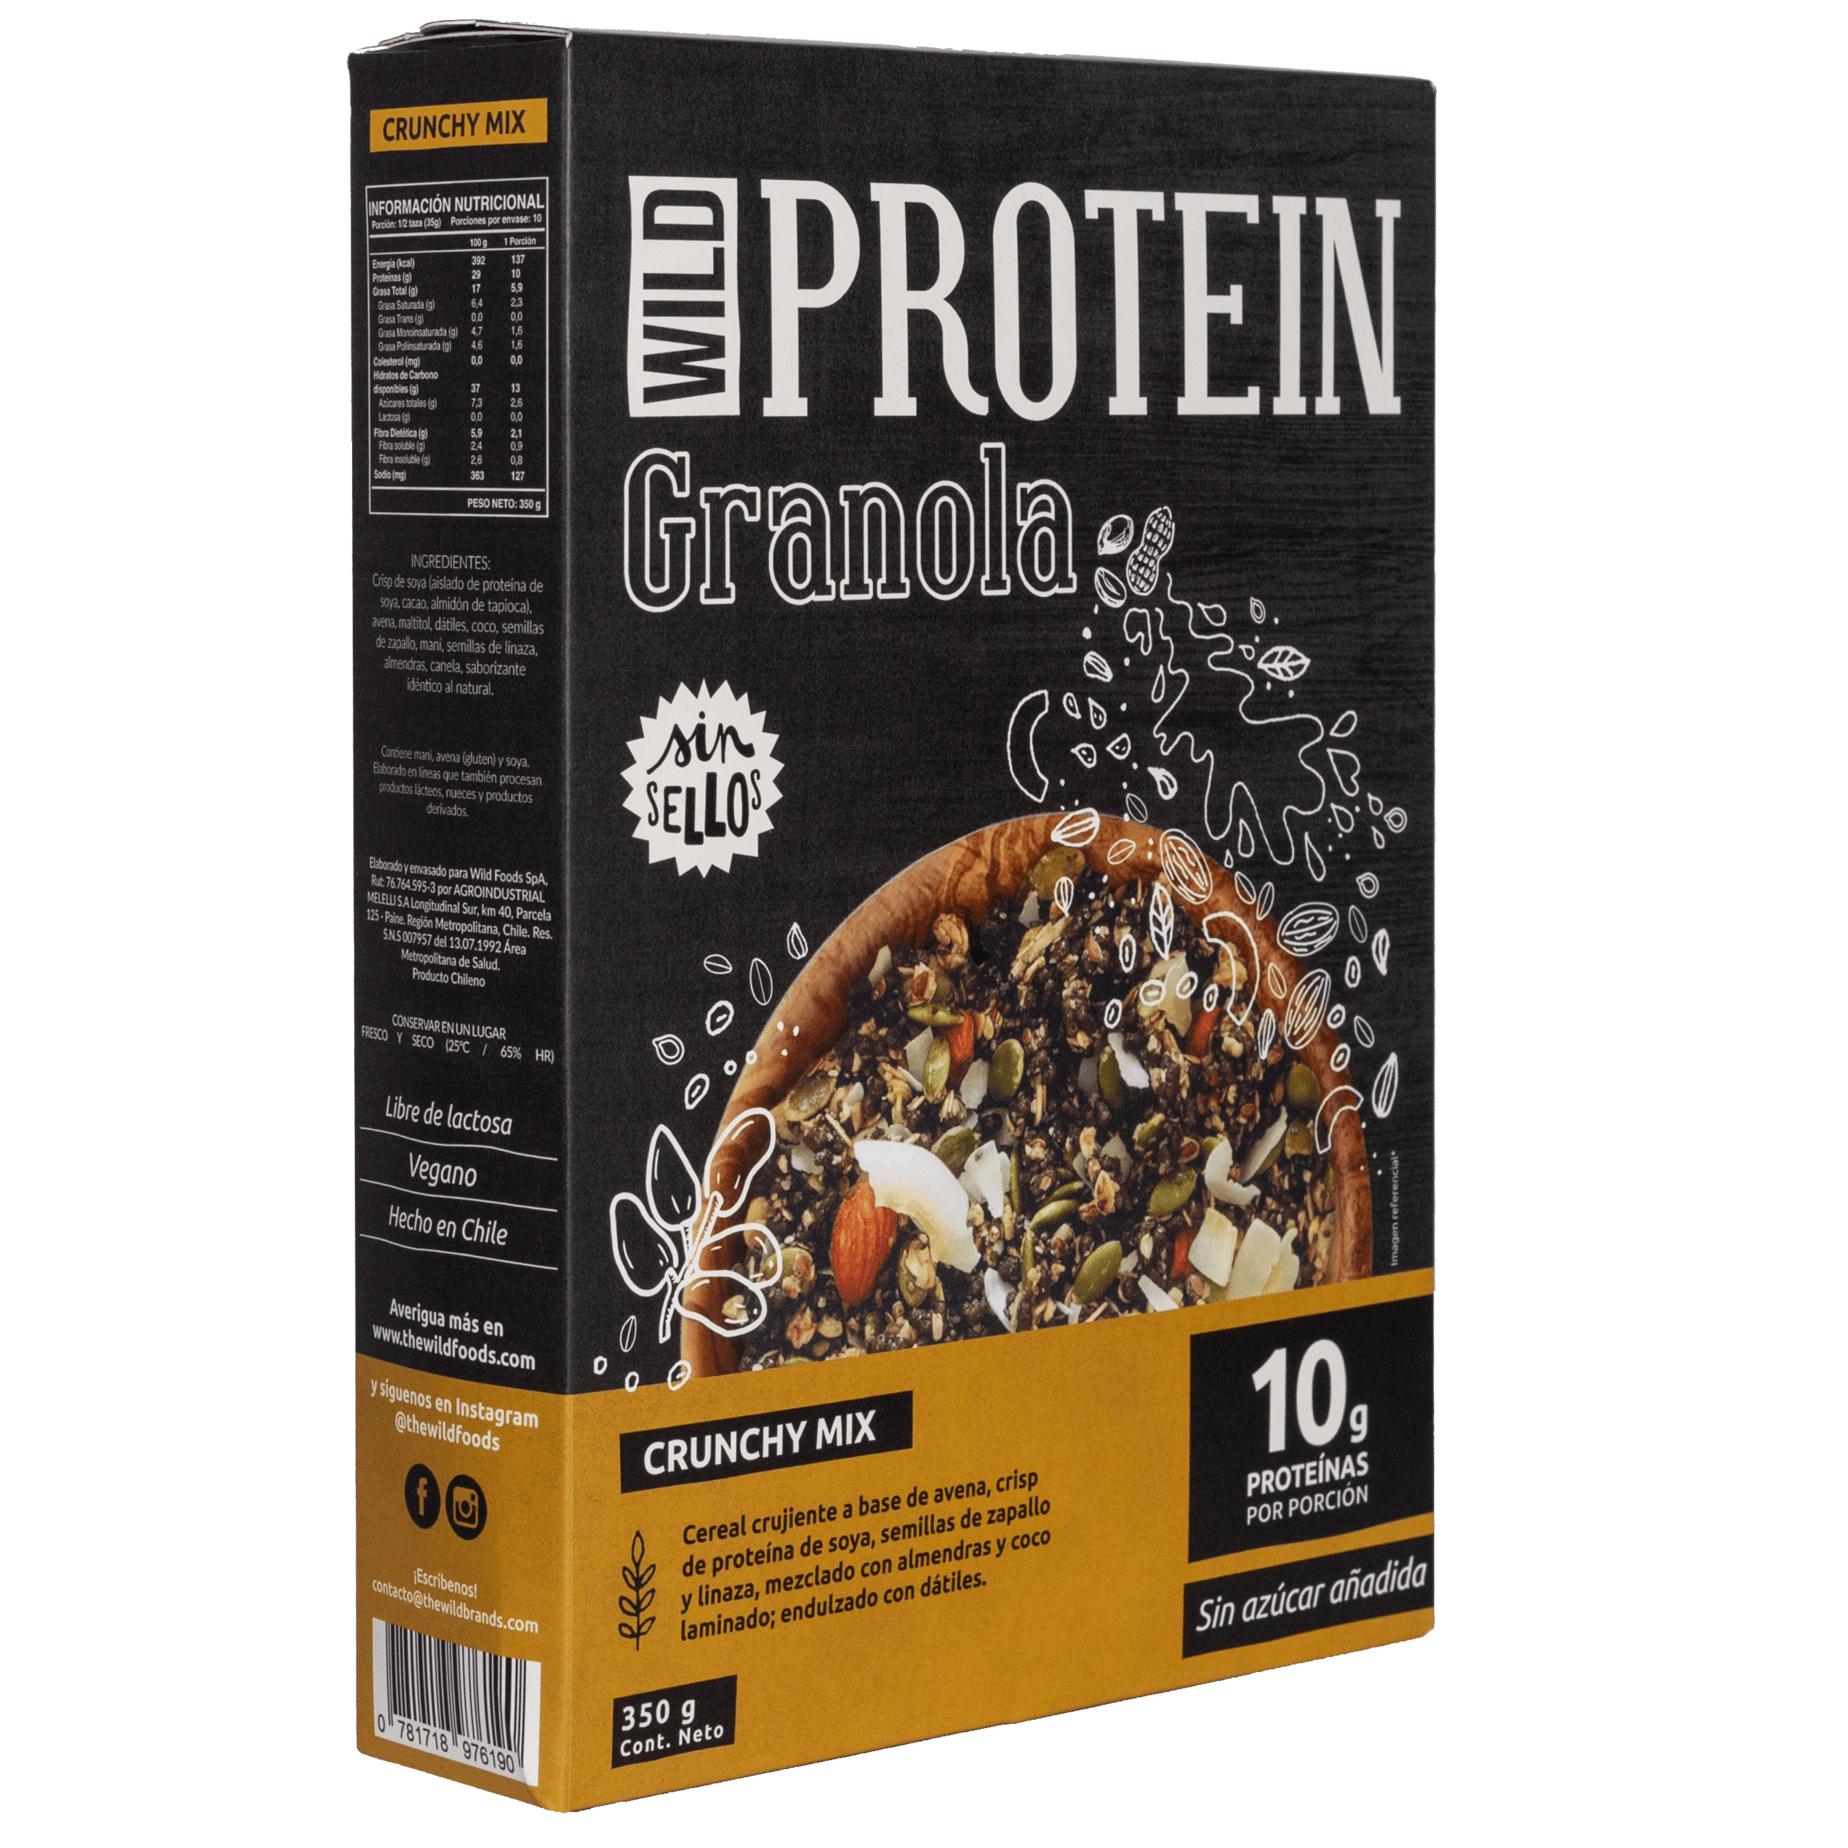 Granola Wild Protein